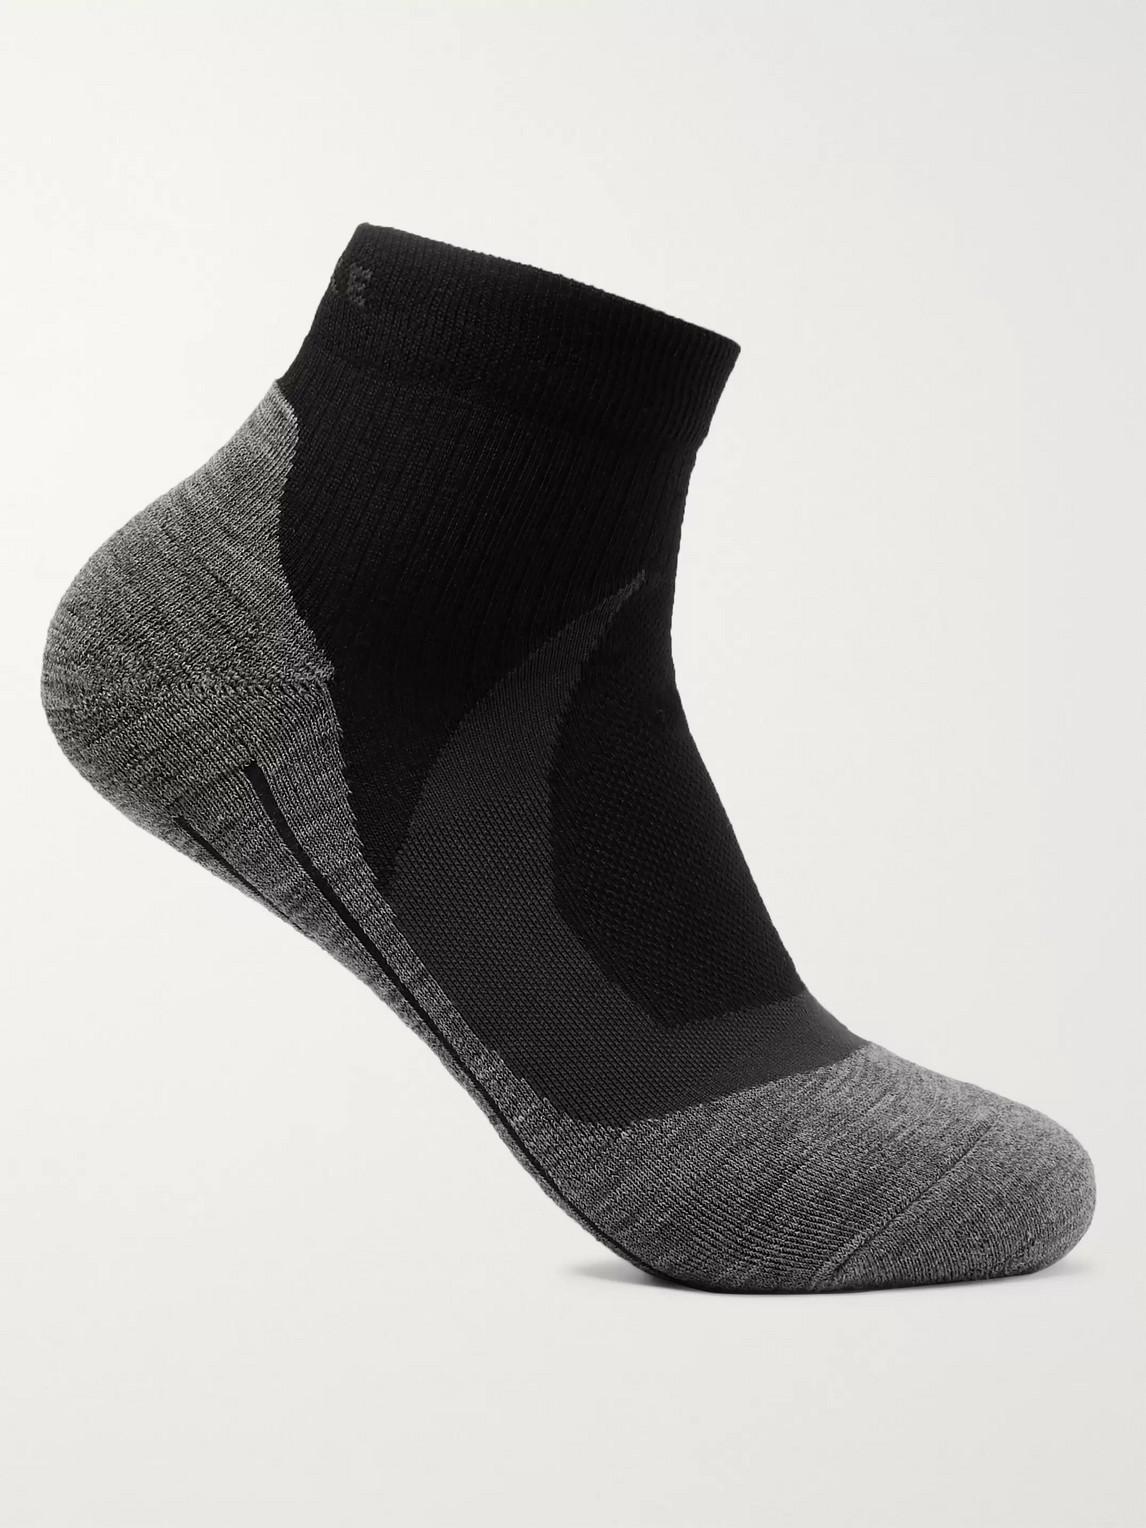 falke ergonomic sport system - ru4 cool stretch-knit socks - men - black